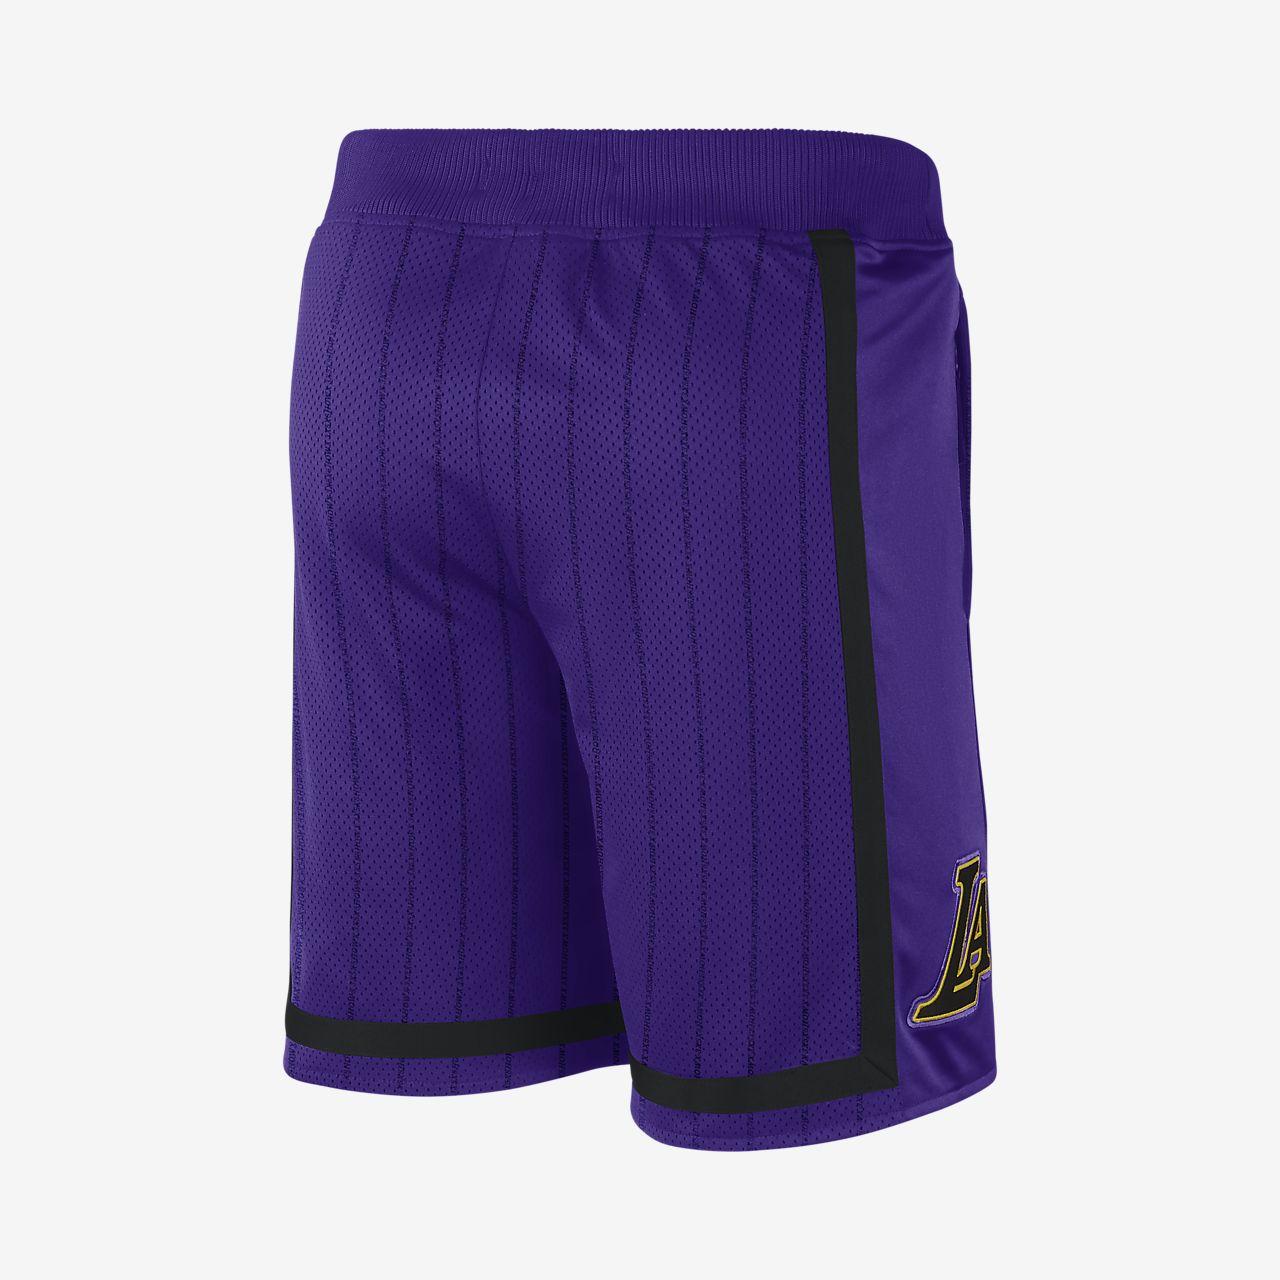 84943b4a6 Los Angeles Lakers Nike Courtside Men s NBA Shorts. Nike.com CH